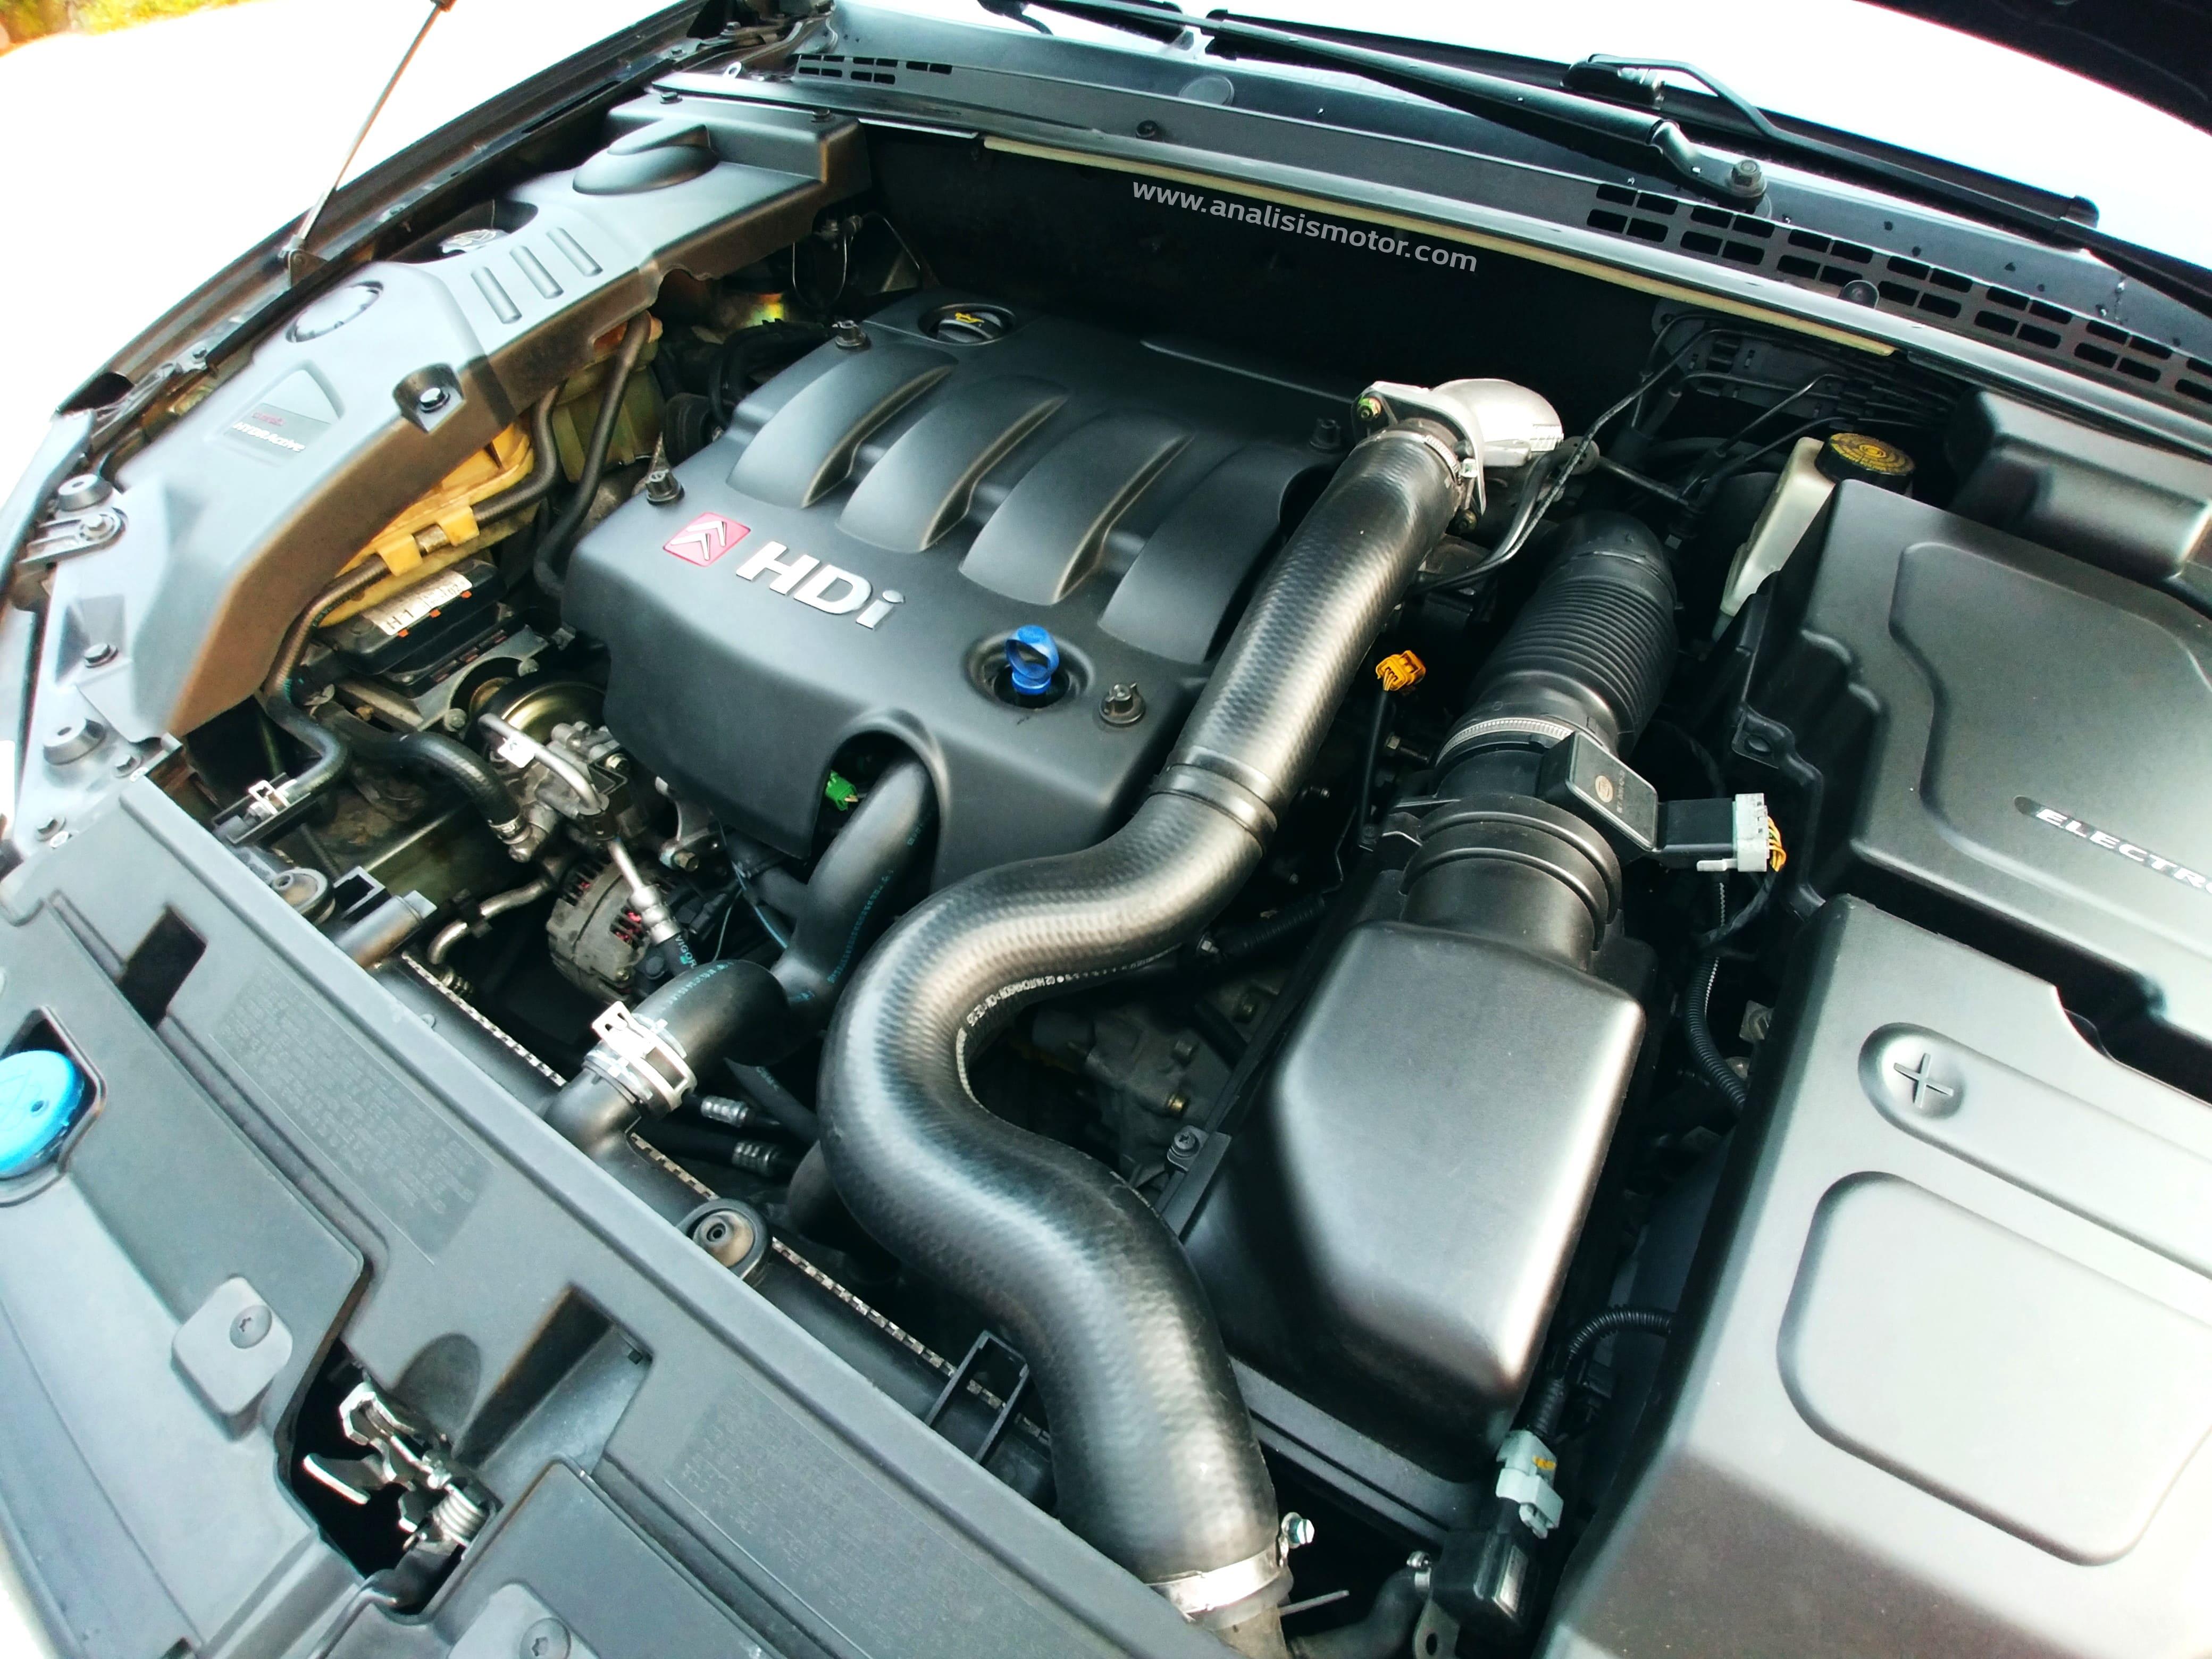 Motor 2.0 HDI 110 Citröen C5 turbo caudalímetro